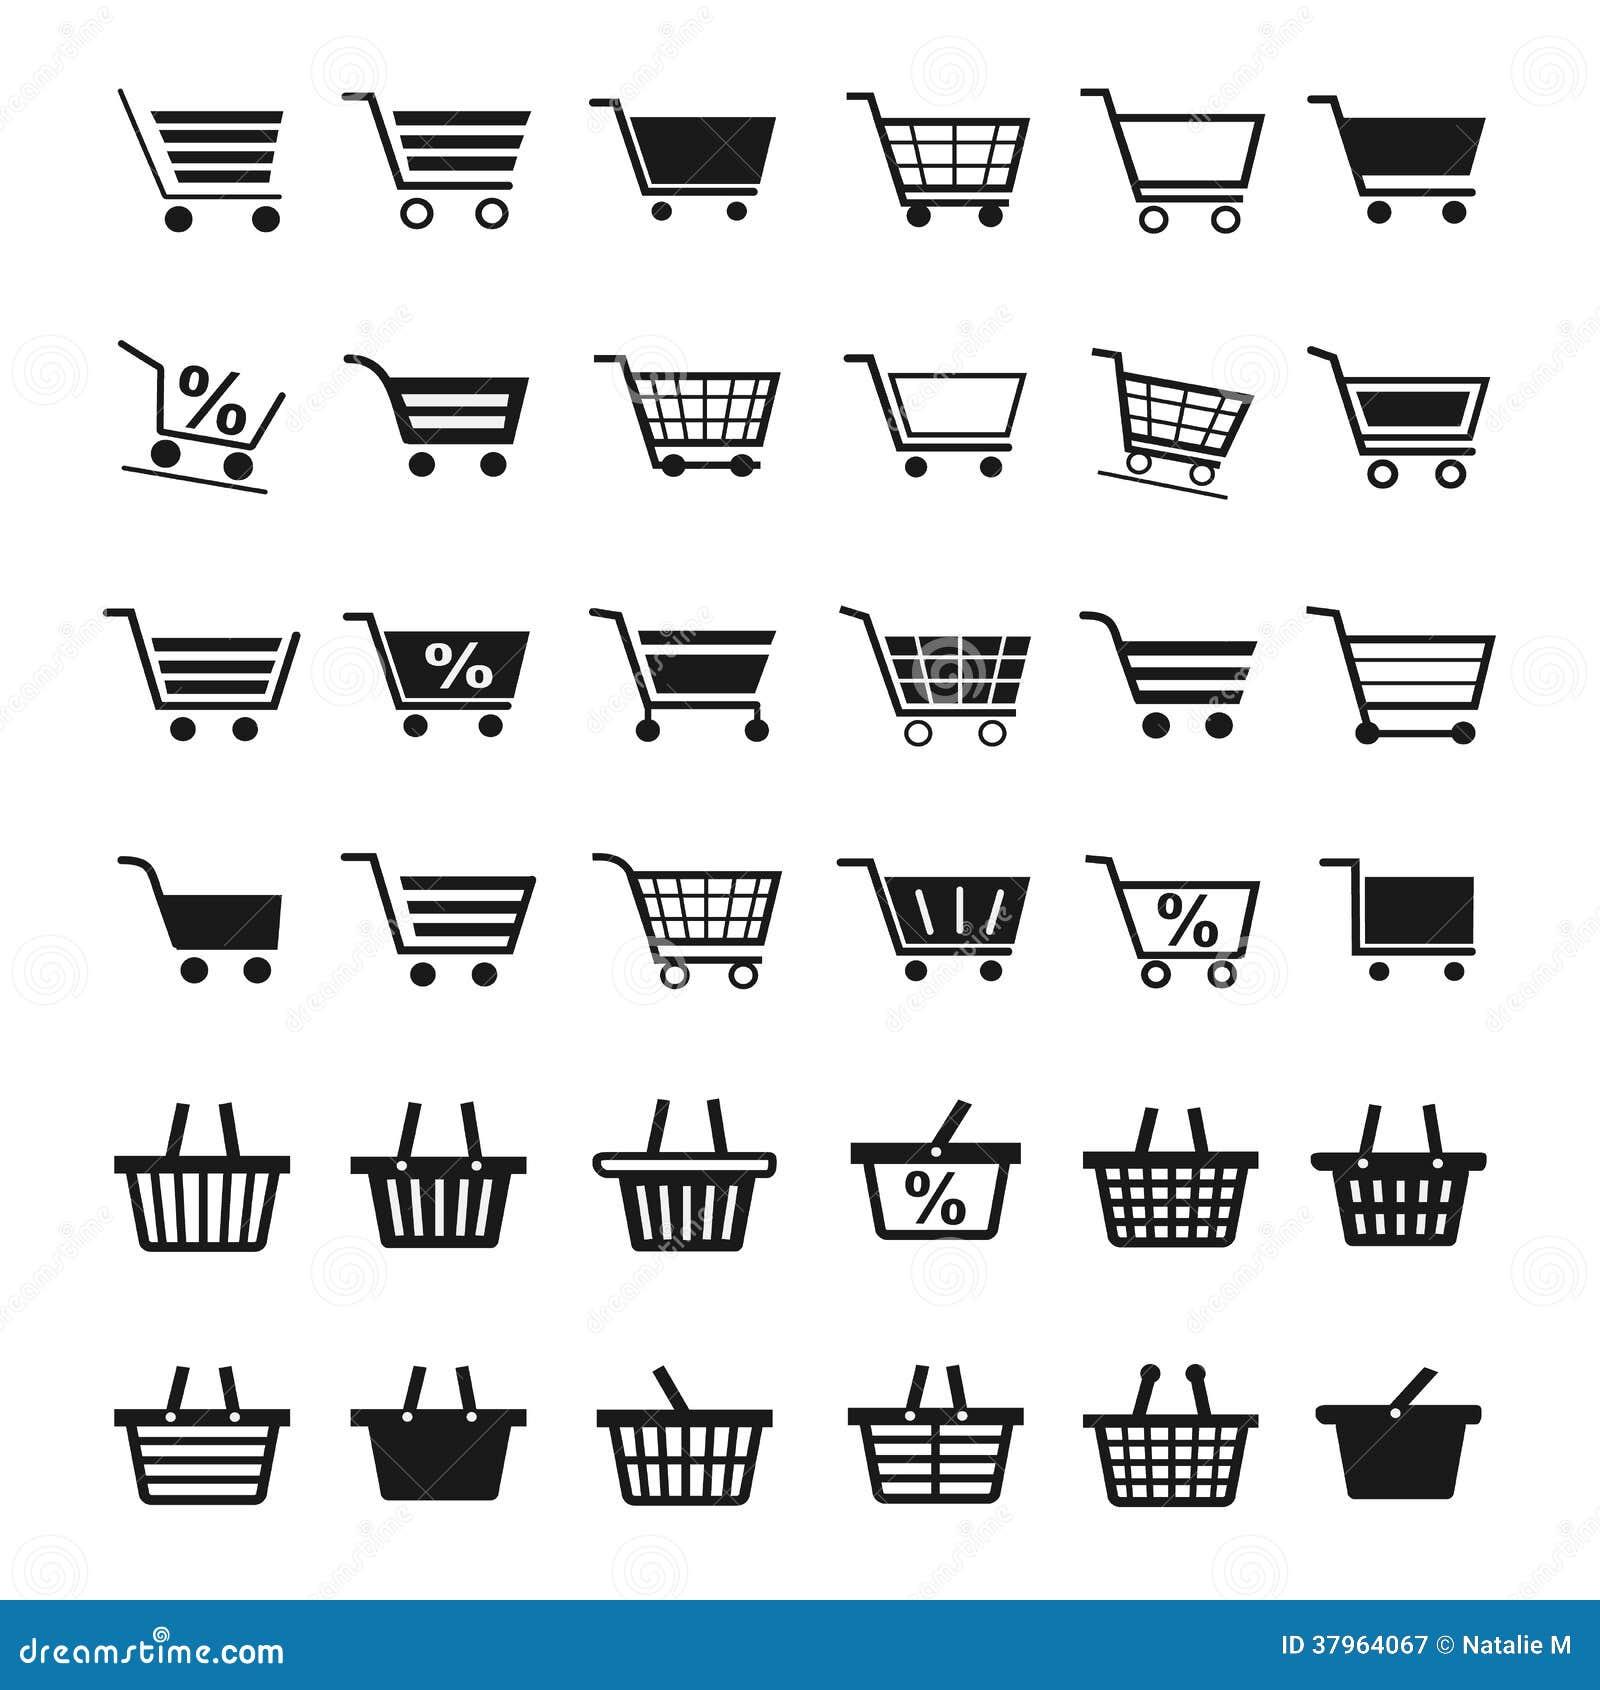 Shopping cart icons royalty free stock photography image 37964067